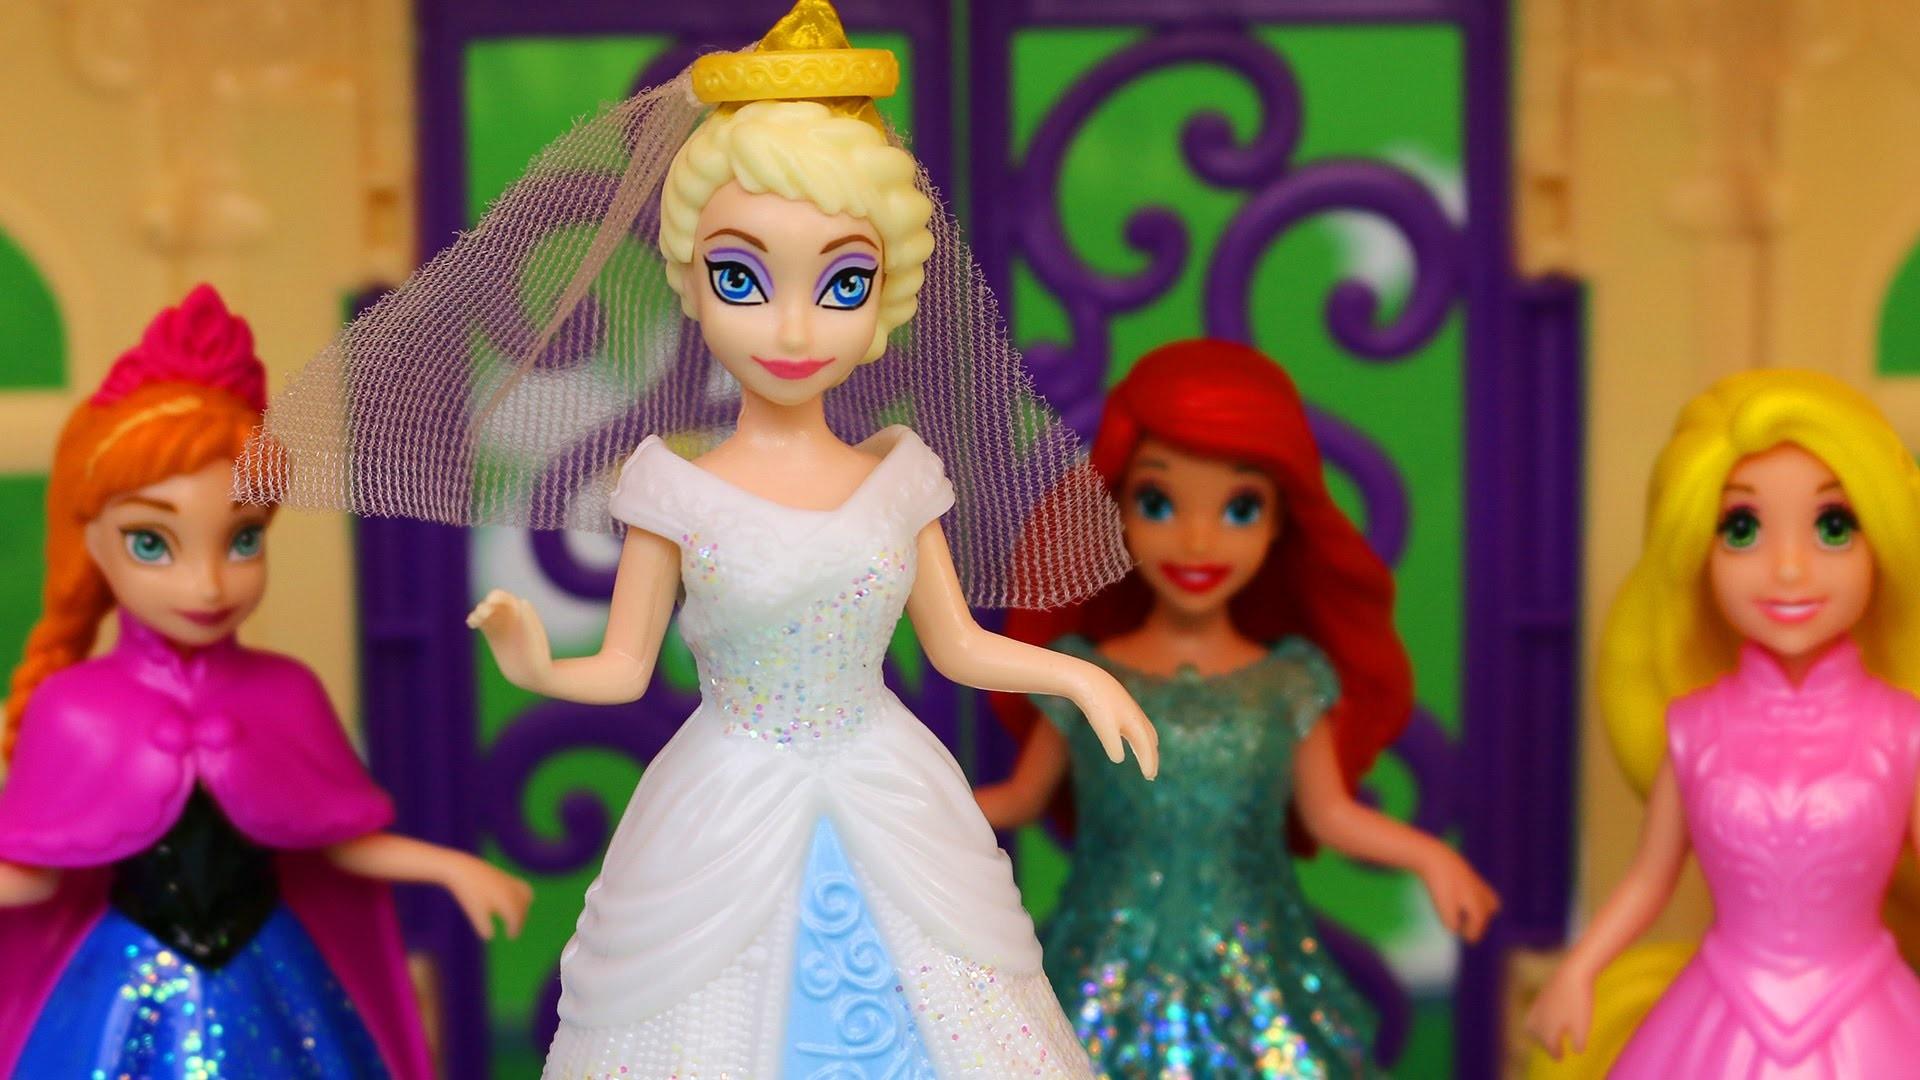 Elsa and Jack Frost Wedding Dress Frozen Anna Rapunzel Ariel to Get Married  – YouTube